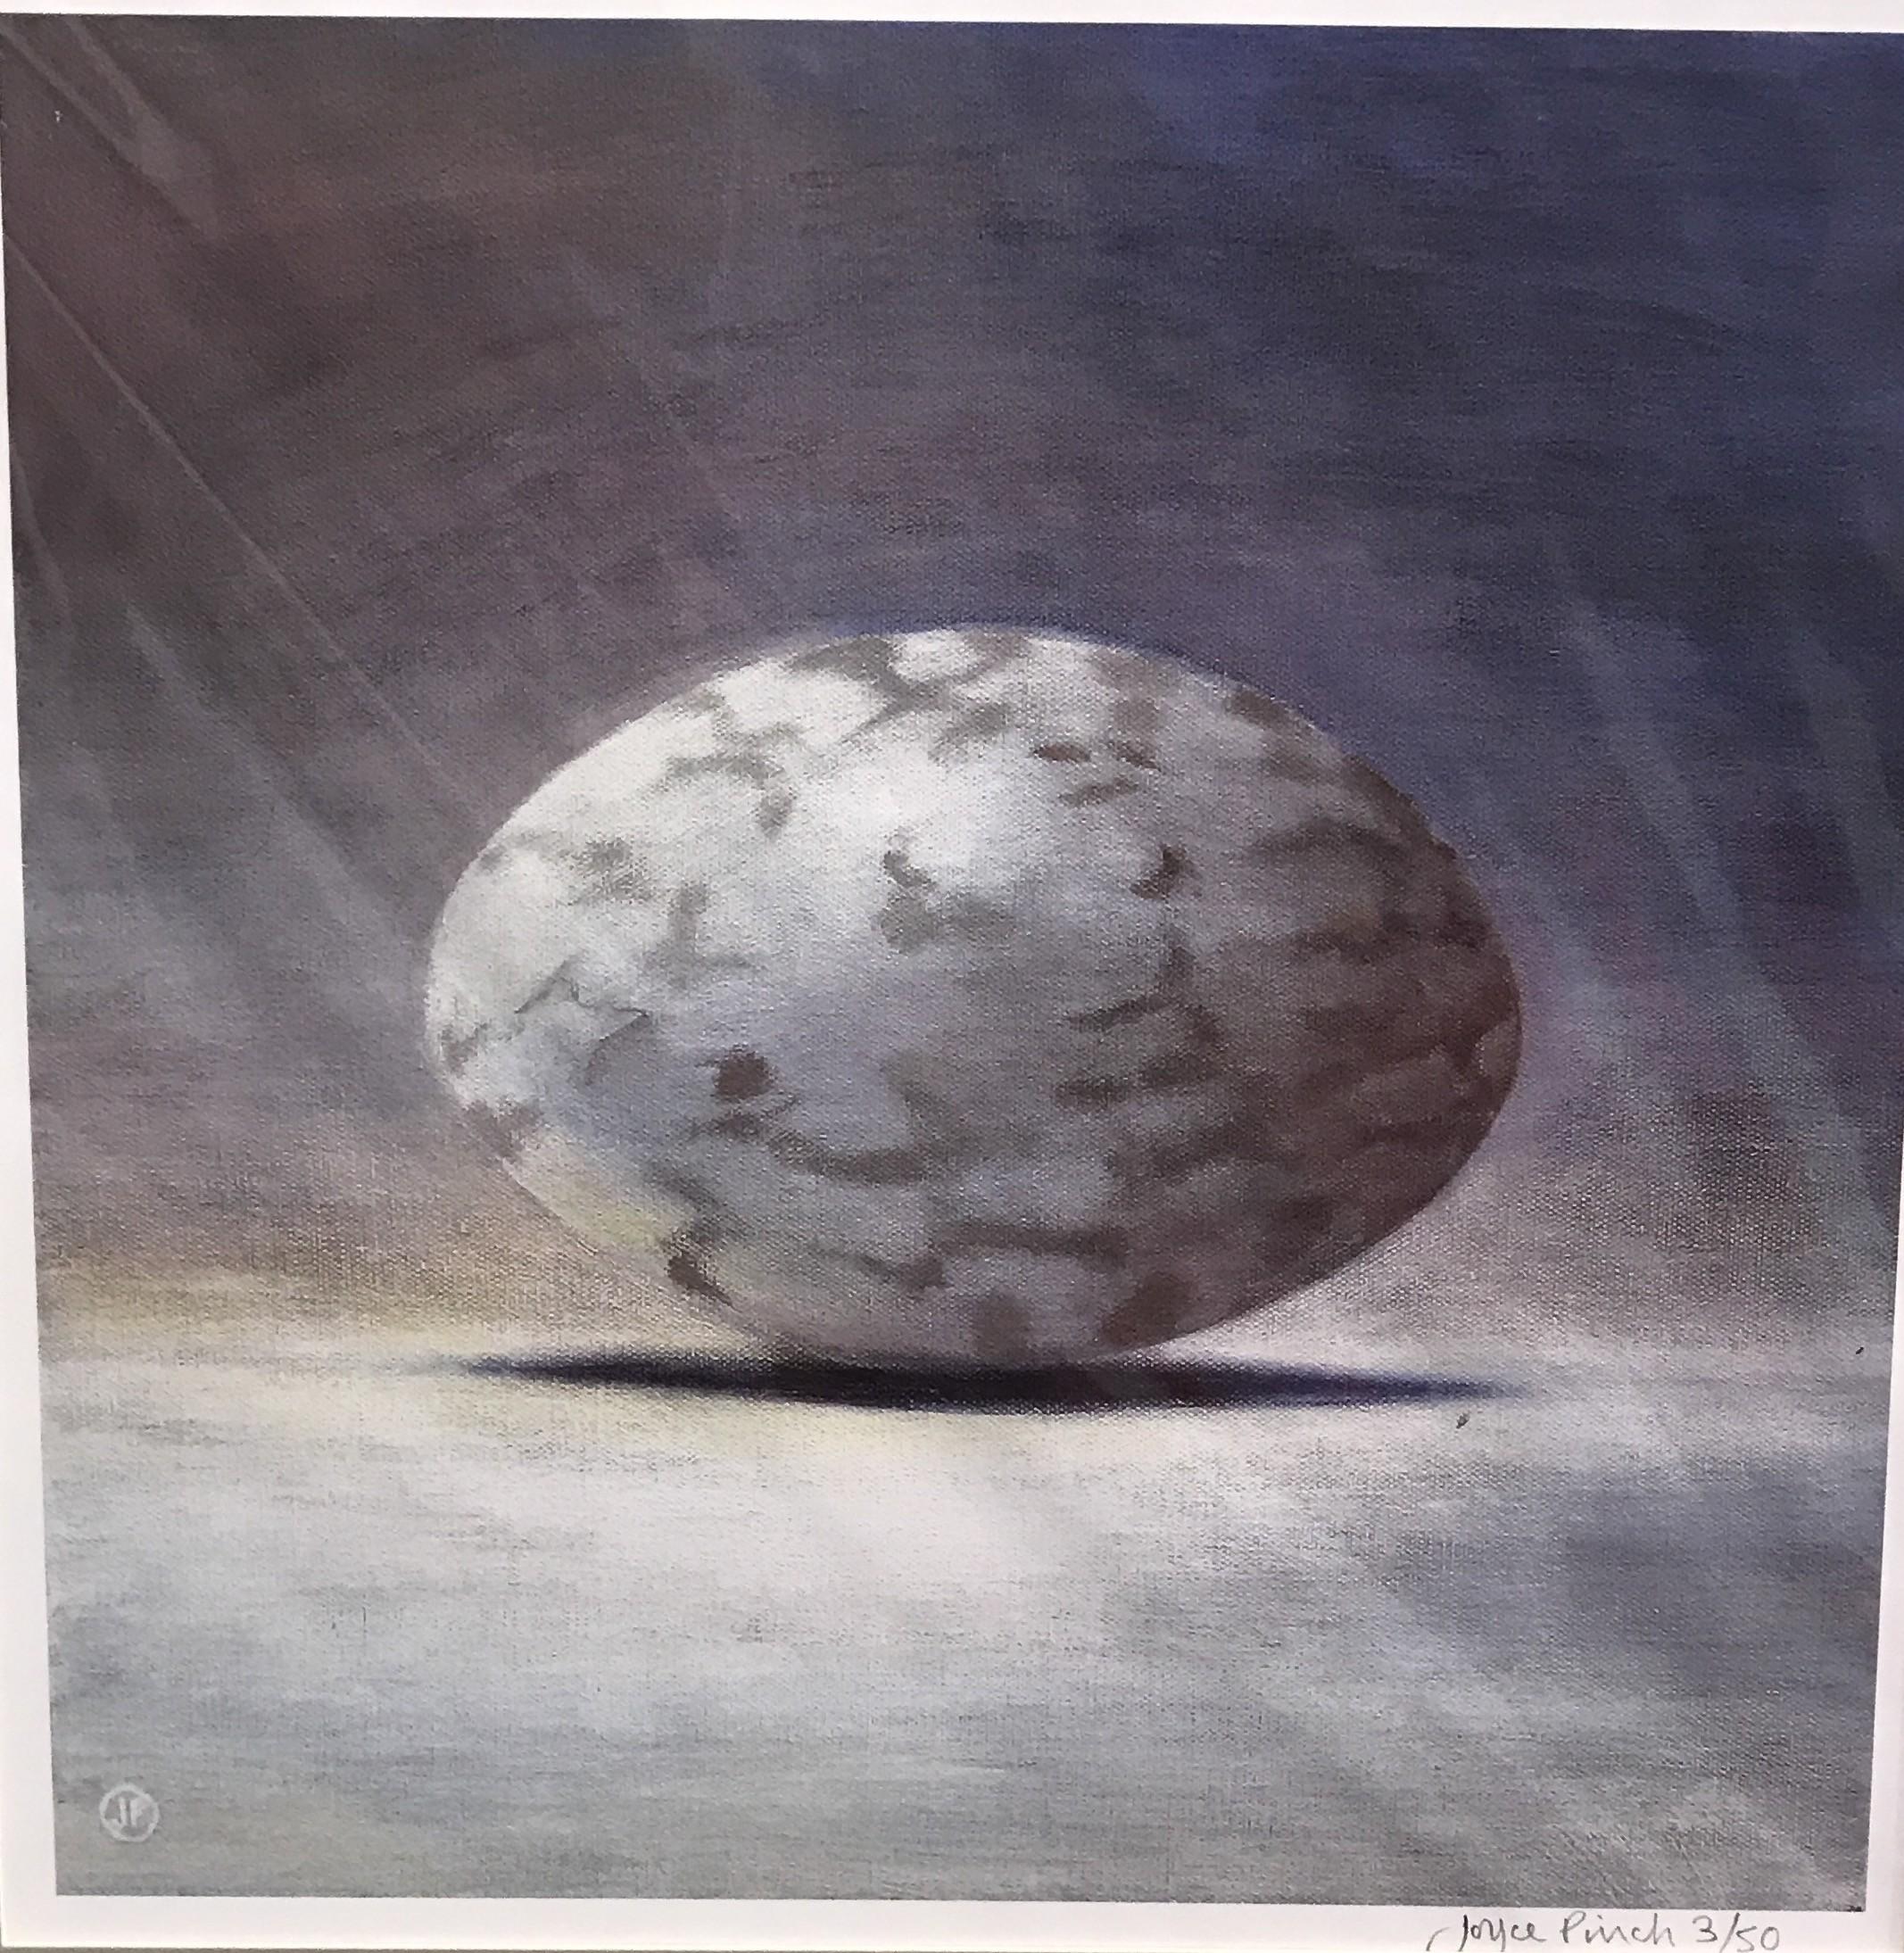 "<span class=""link fancybox-details-link""><a href=""/artists/34-joyce-pinch/works/84-joyce-pinch-nightjar-egg/"">View Detail Page</a></span><div class=""artist""><strong>Joyce Pinch</strong></div> <div class=""title""><em>Nightjar Egg</em></div> <div class=""medium"">Limited Edition Print (framed)</div> <div class=""dimensions"">26 x 26  cm</div> <div class=""edition_details"">Edition of 50</div>"